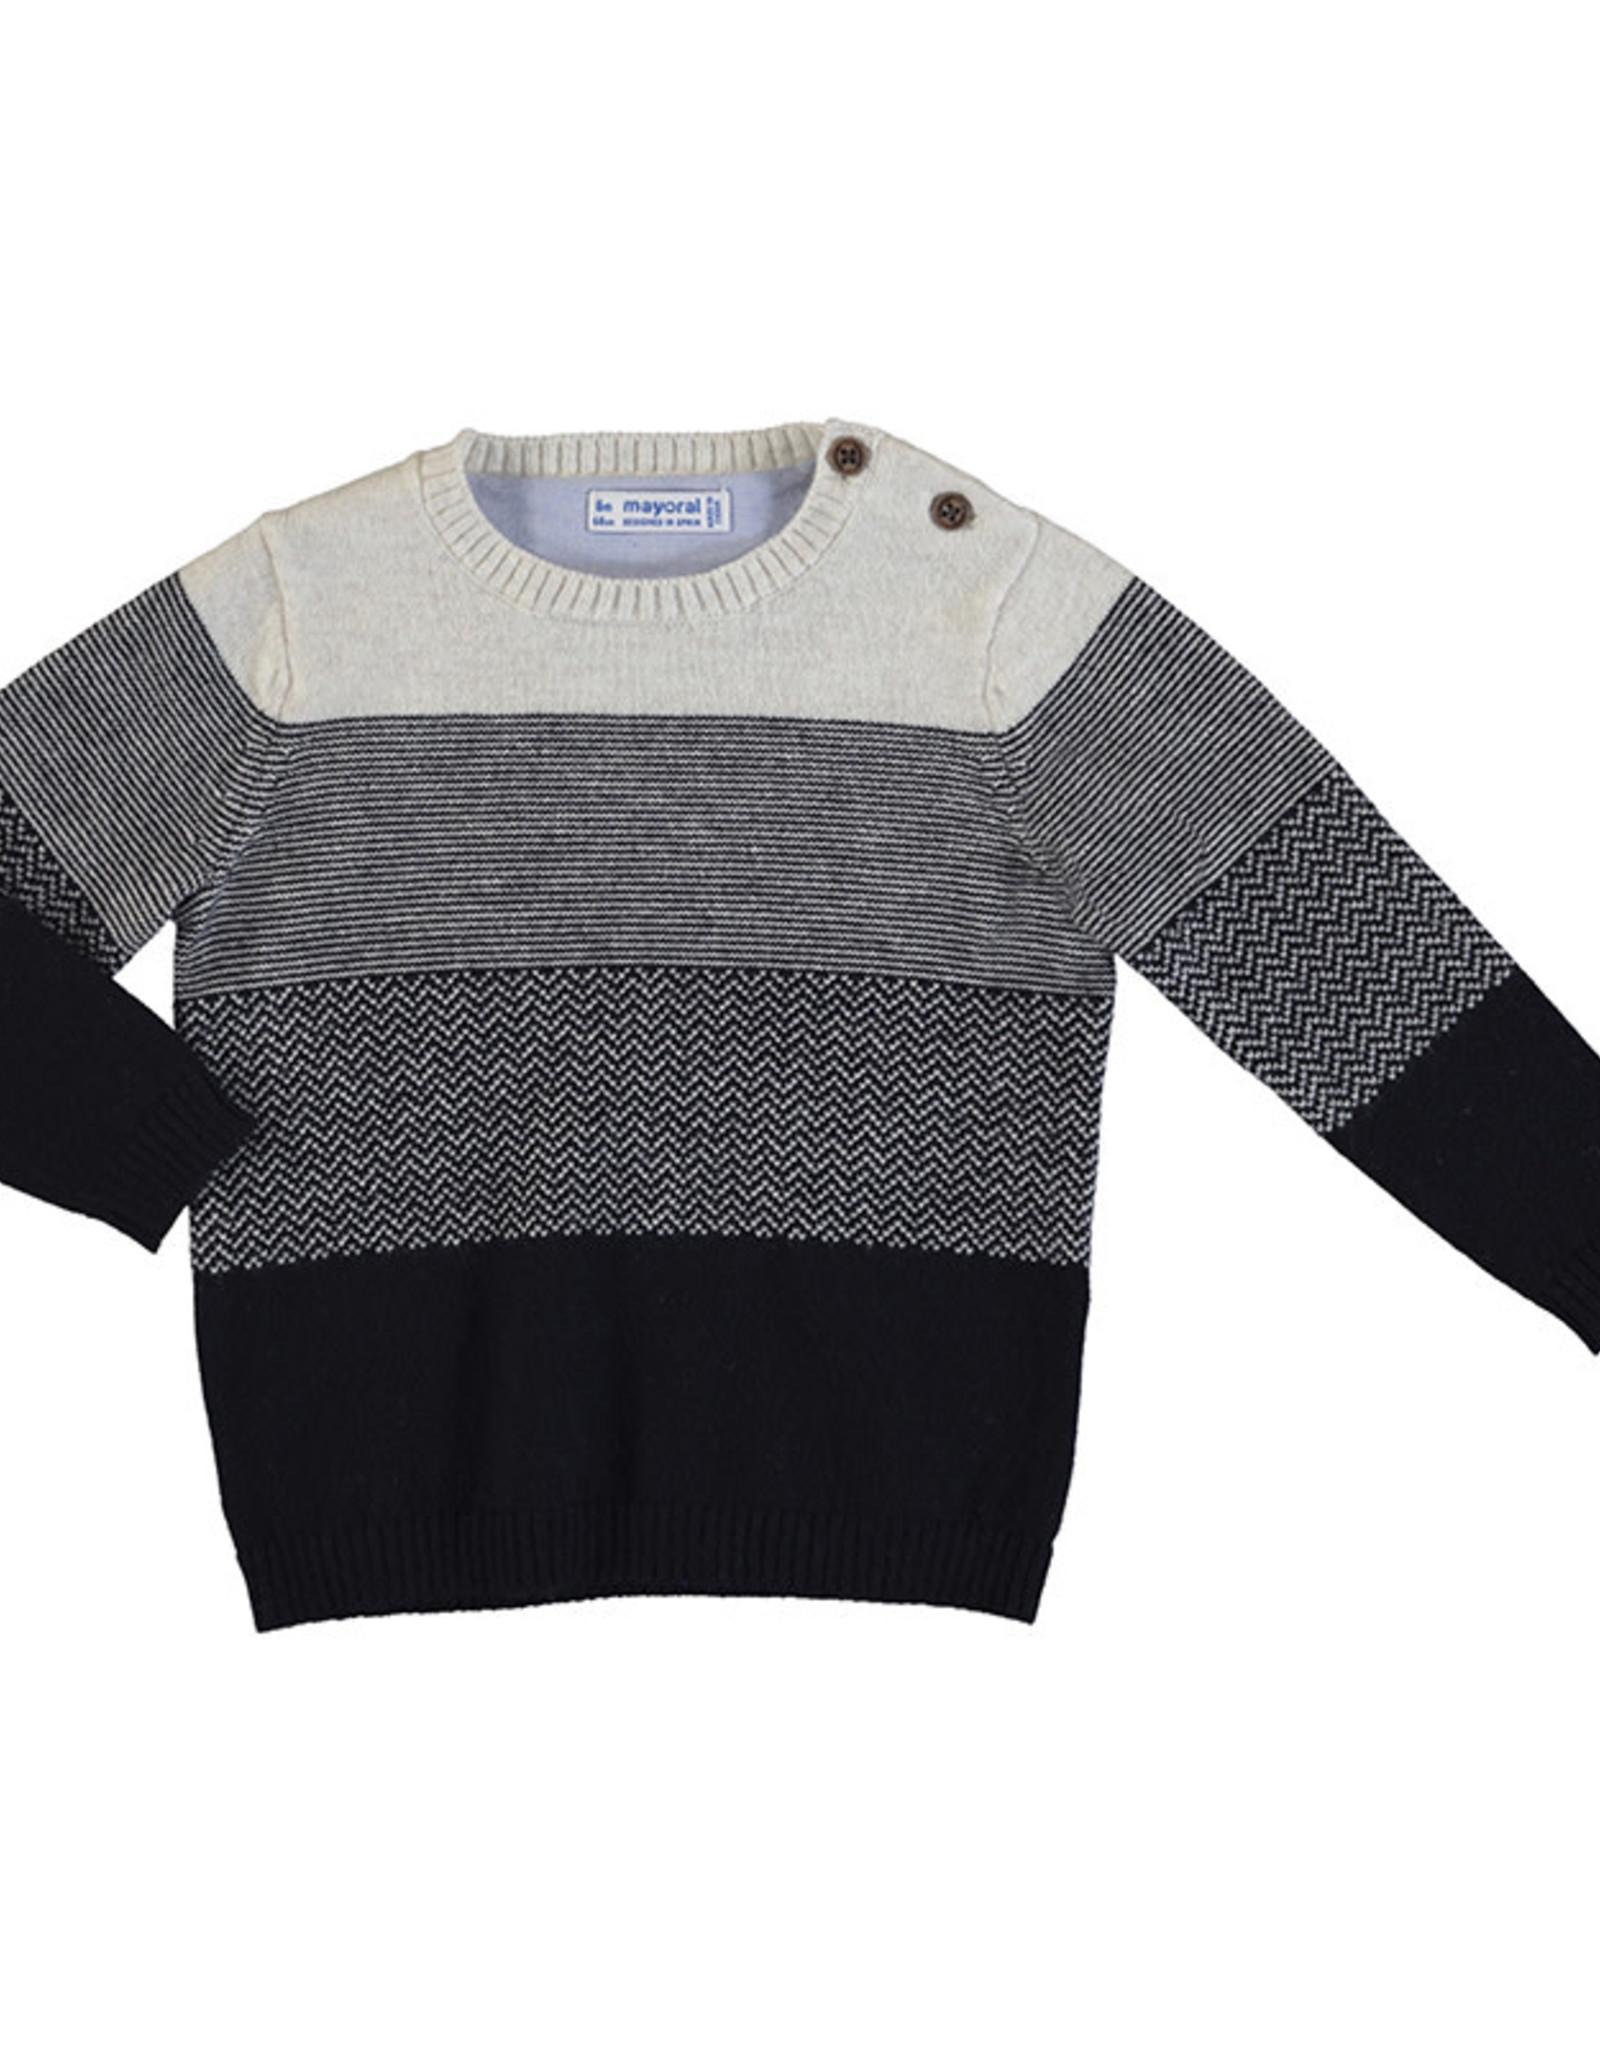 Mayoral Infant Boys Navy Cream Stripe Sweater